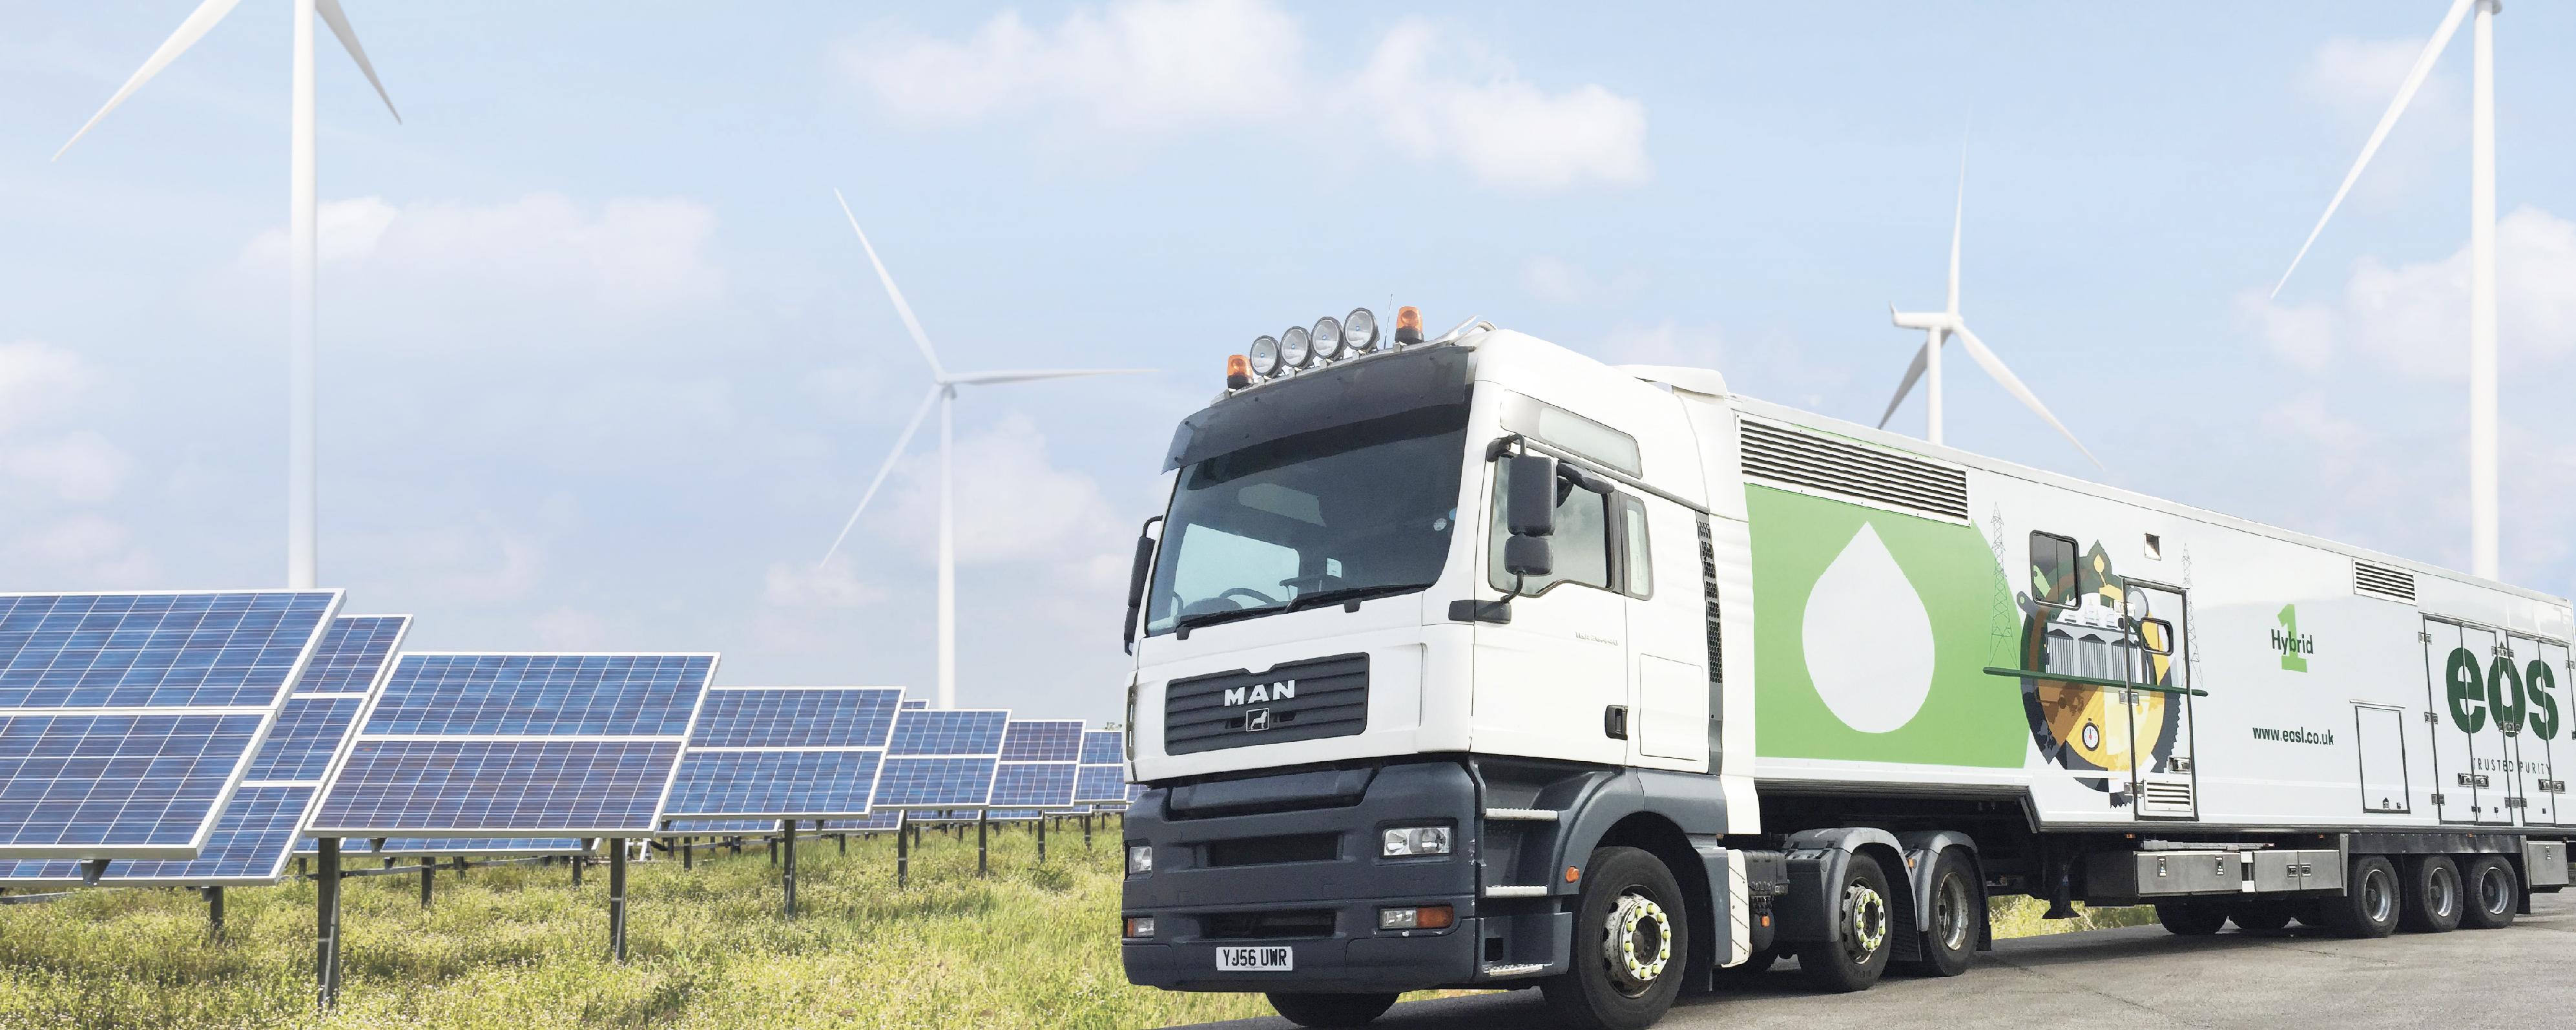 Module24 EOS Solarpark Transformator Oi Service EN